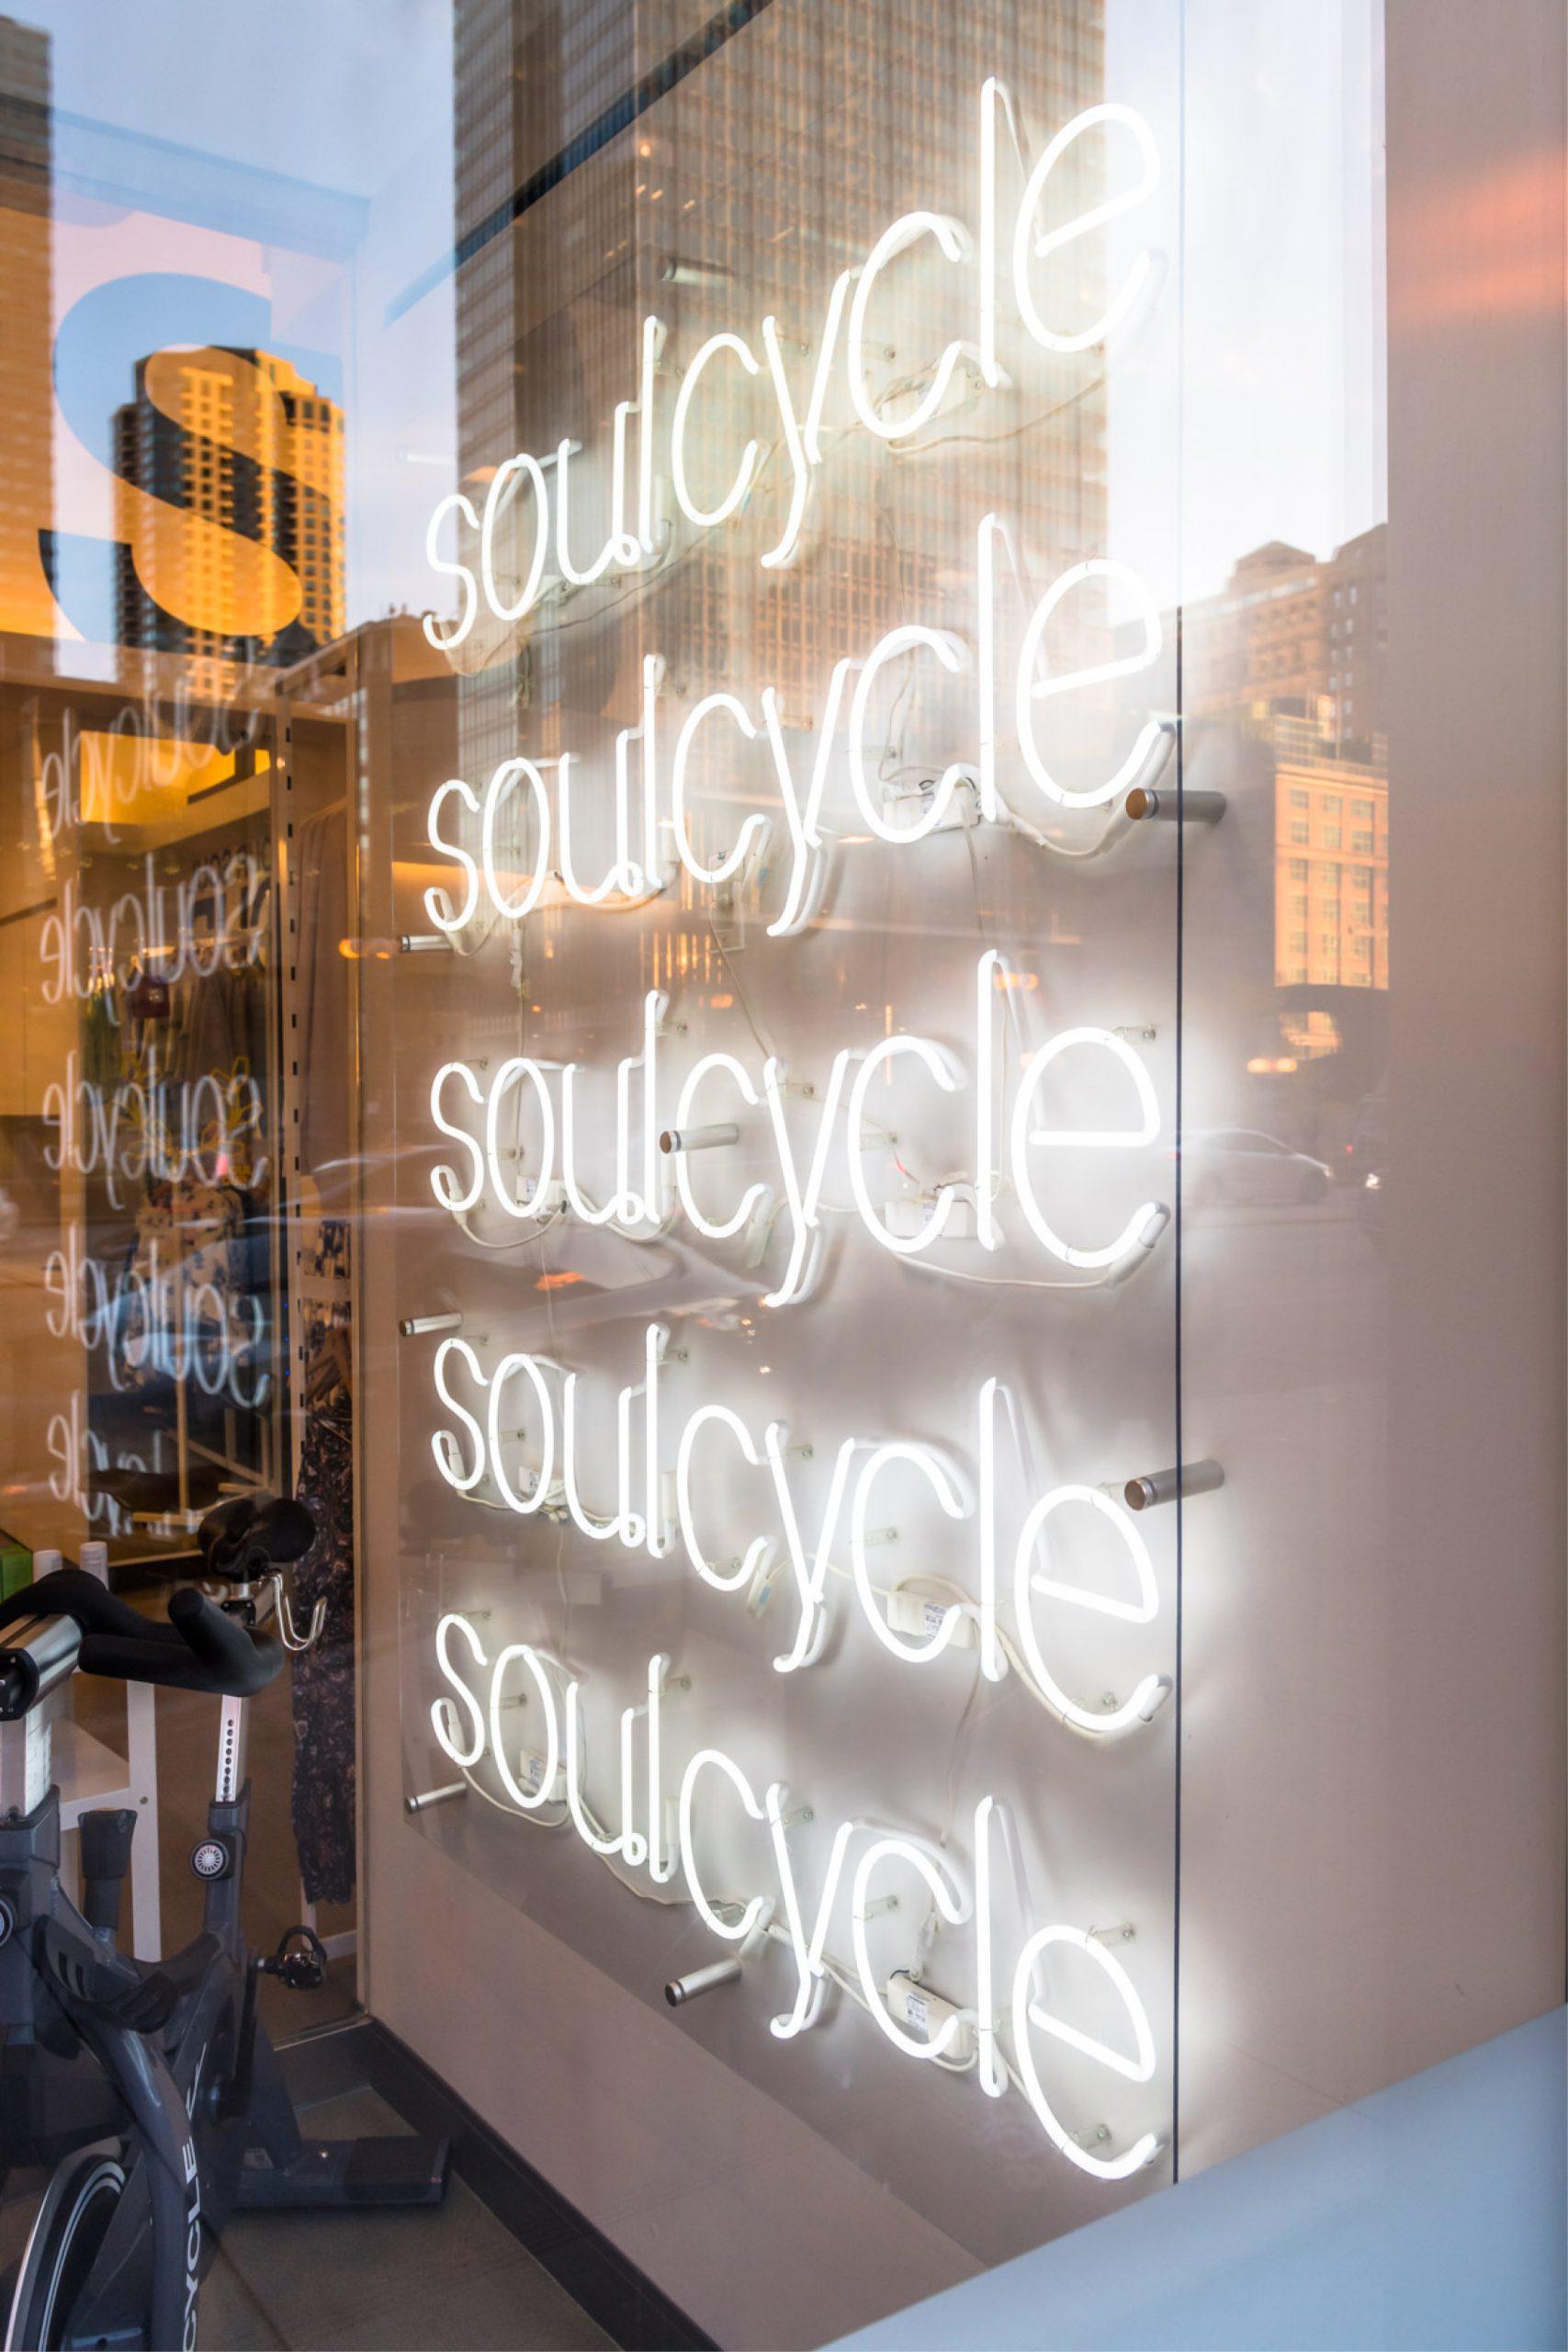 Lake & Wells Soul Cycle